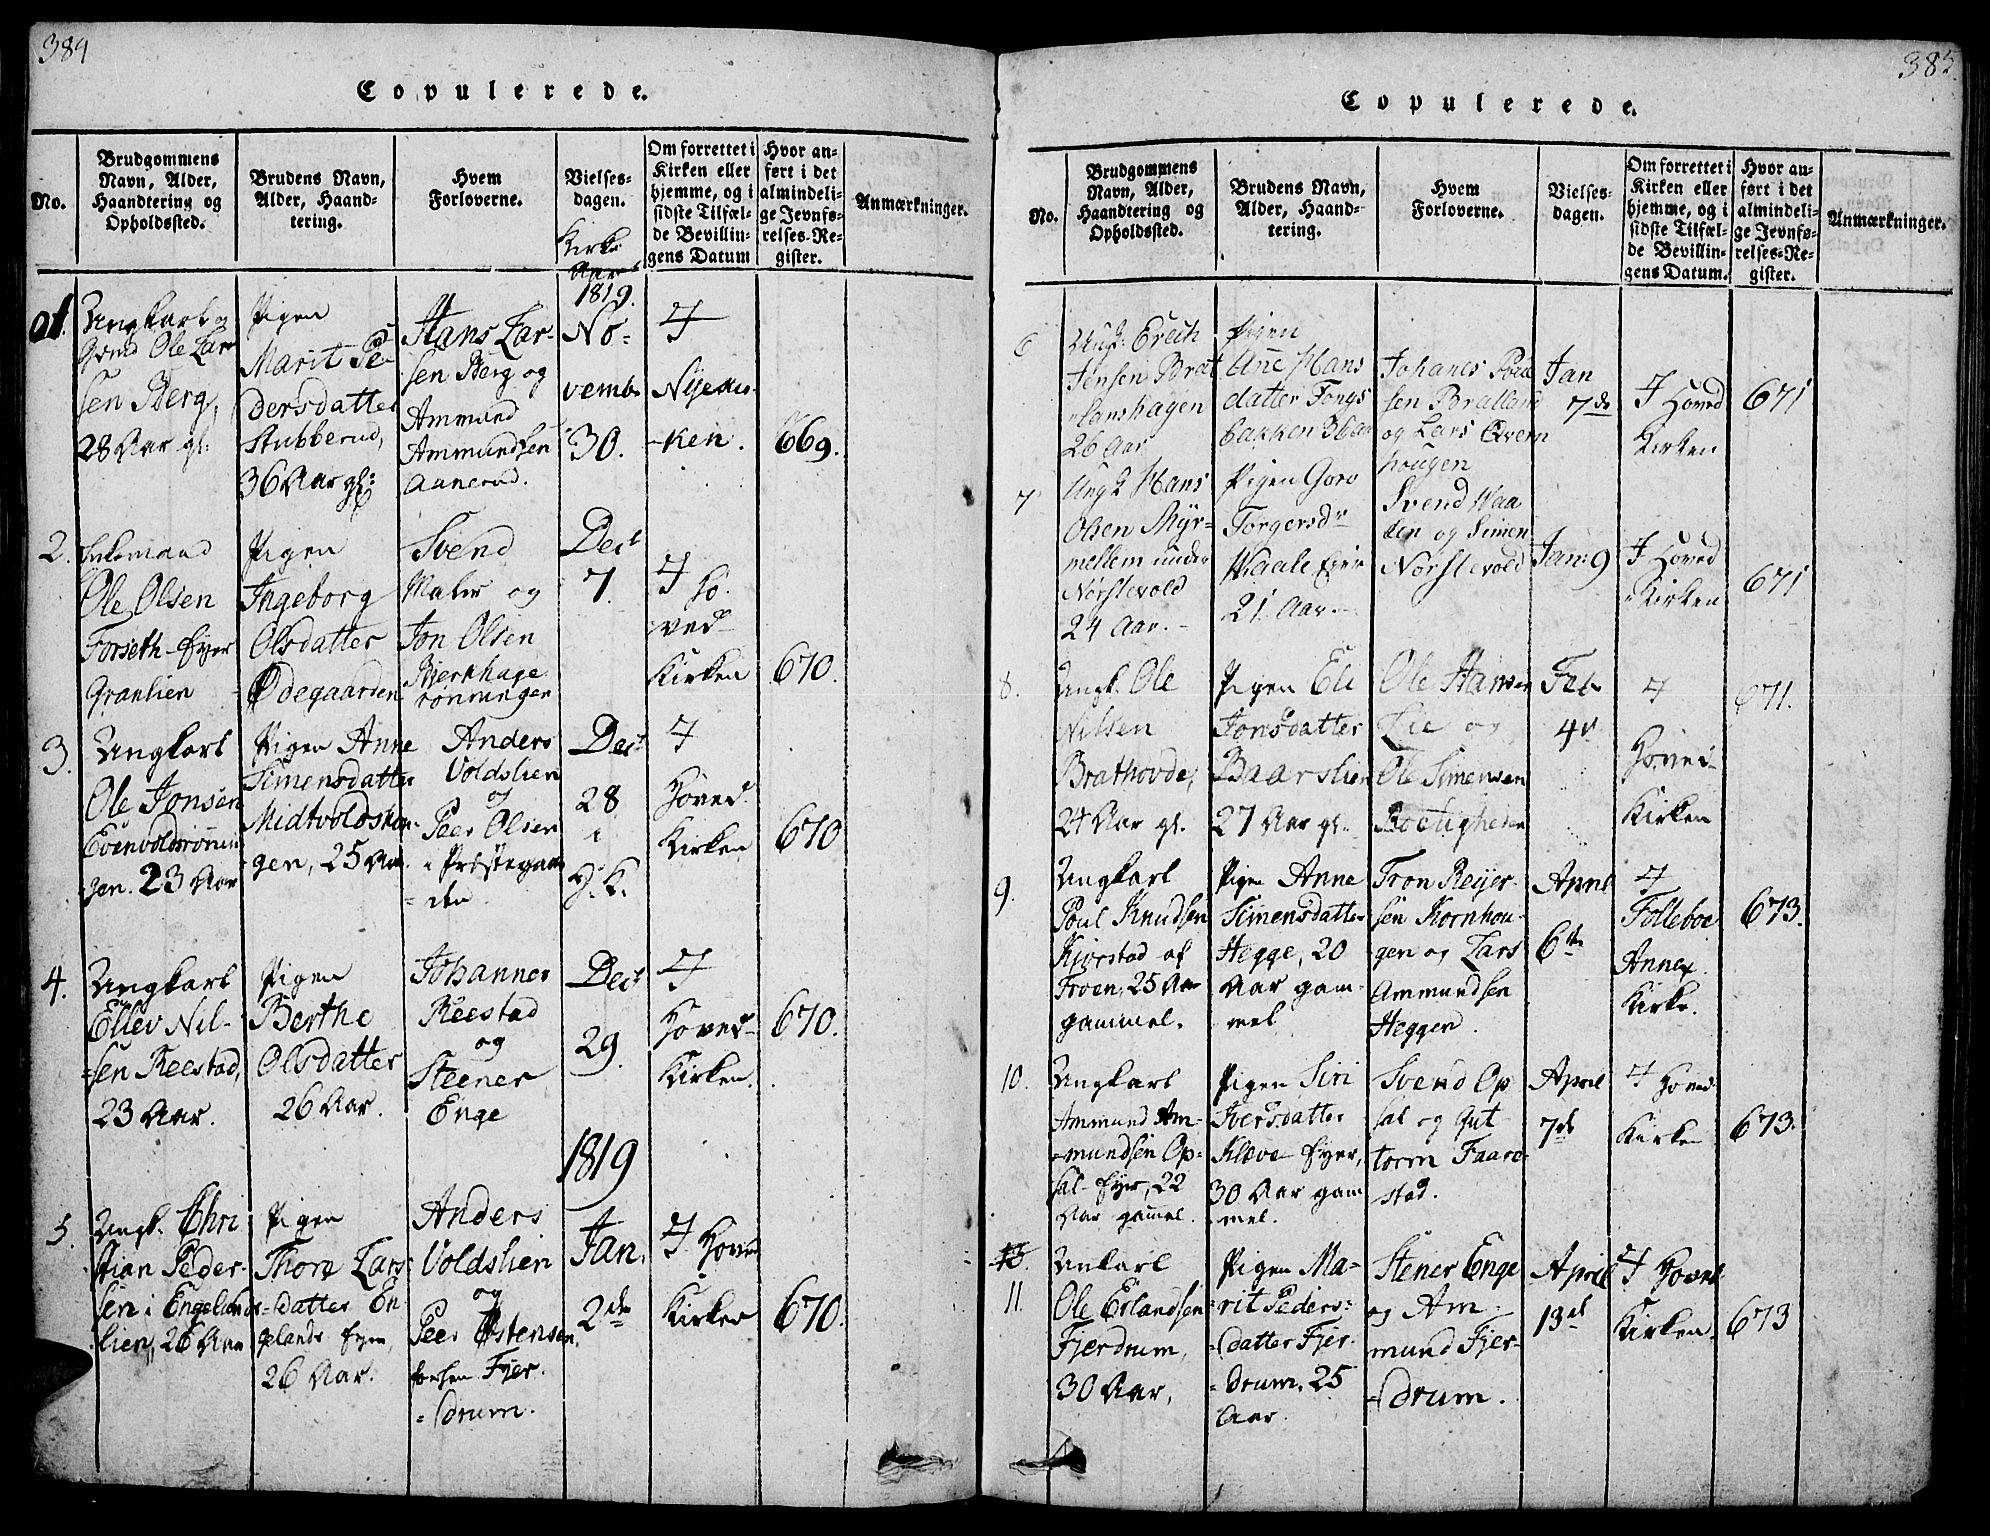 SAH, Gausdal prestekontor, Ministerialbok nr. 5, 1817-1829, s. 384-385